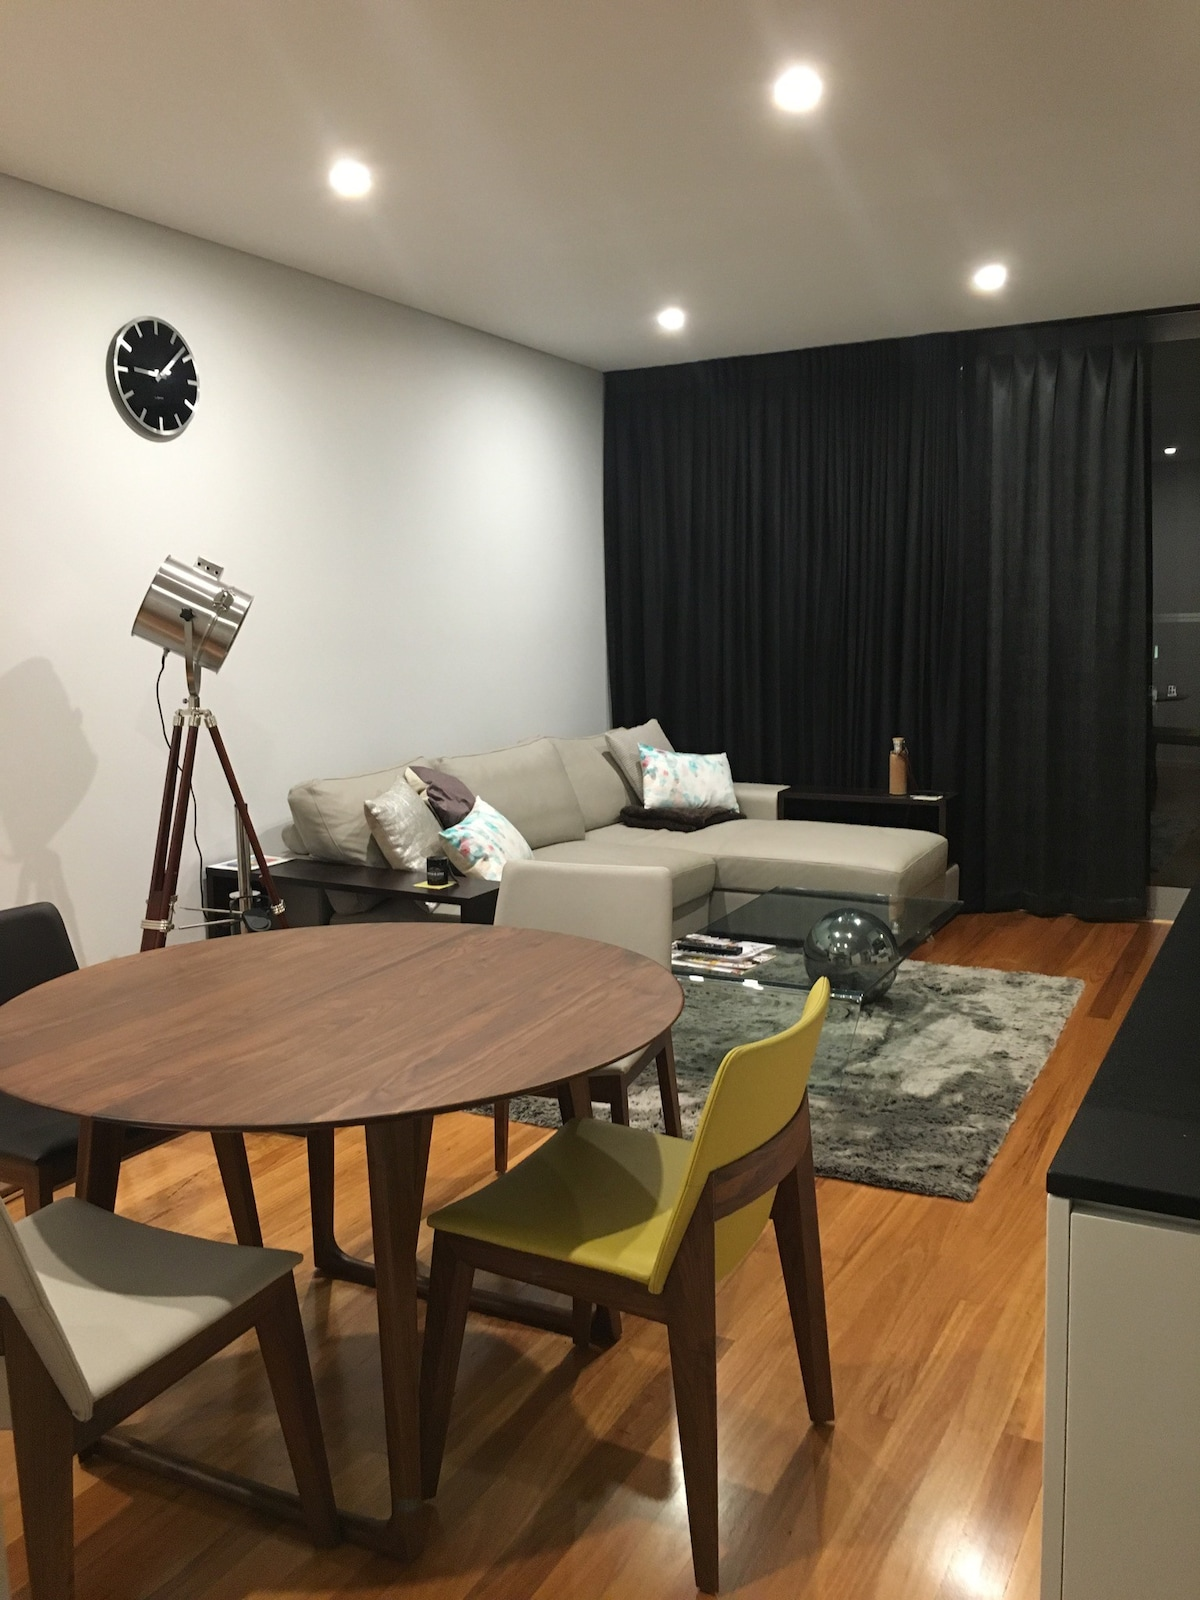 Chic Urban Apartment   Apartments For Rent In Subiaco, Western Australia,  Australia